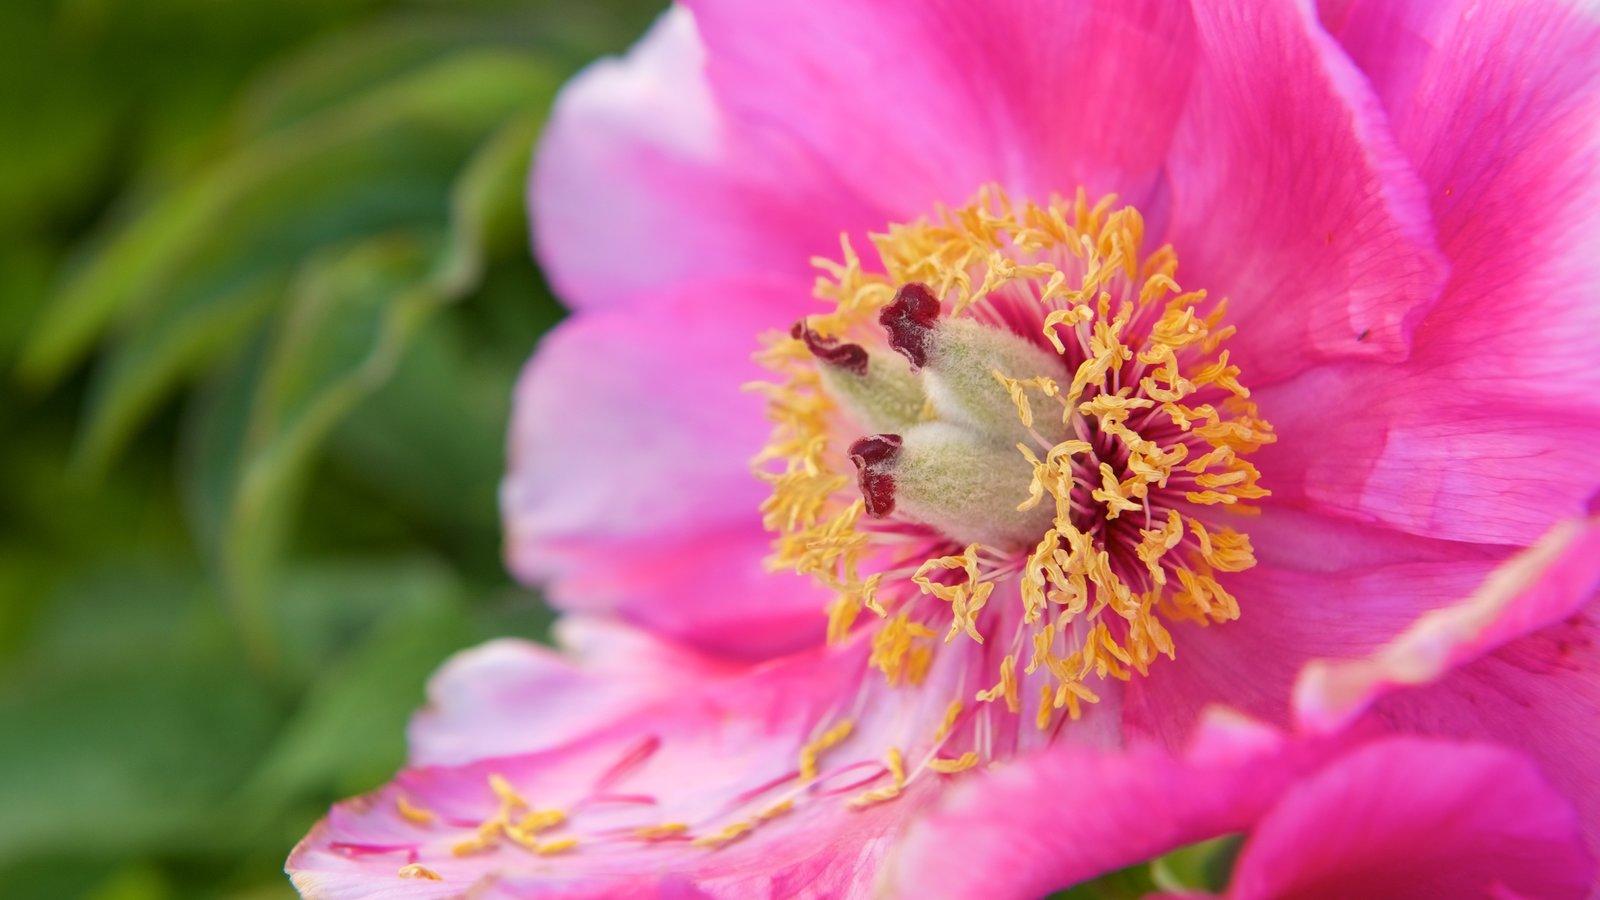 Arktisk alpin Botanisk hage que inclui flores